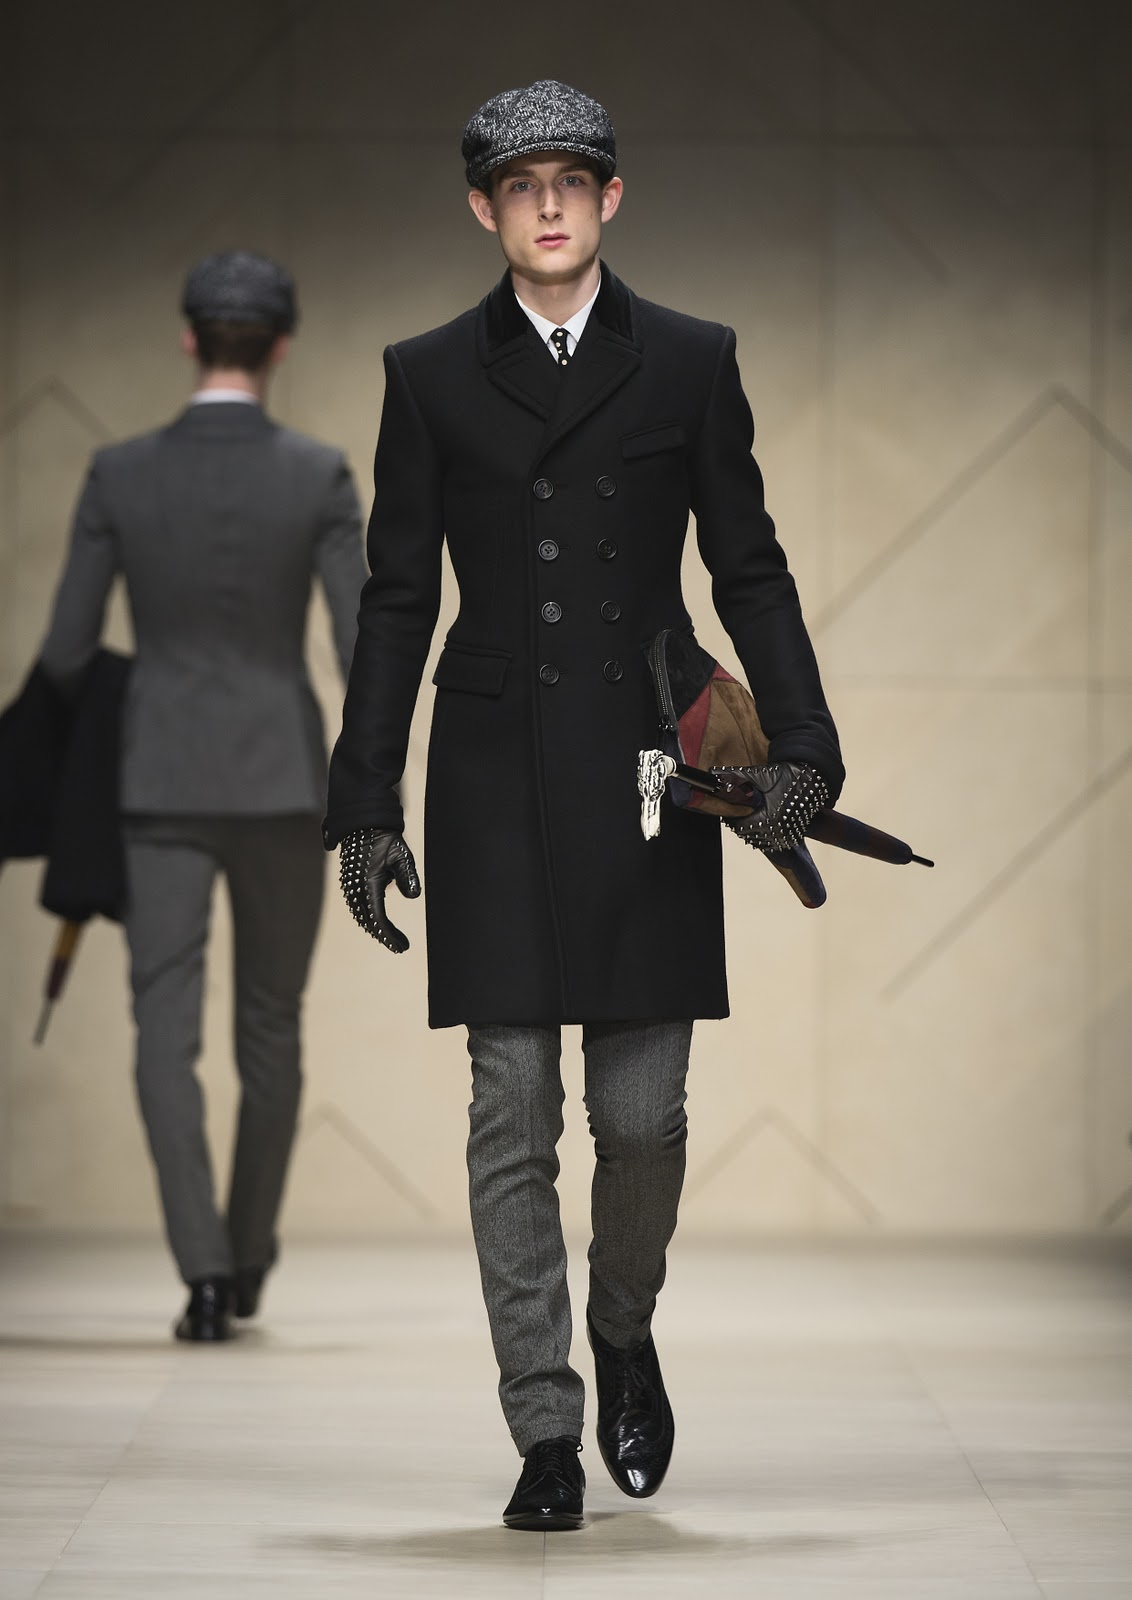 Burberry Prorsum Runway London Fashion Week Aw14: The Fashion Fiend: Burberry Prorsum Menswear AW12